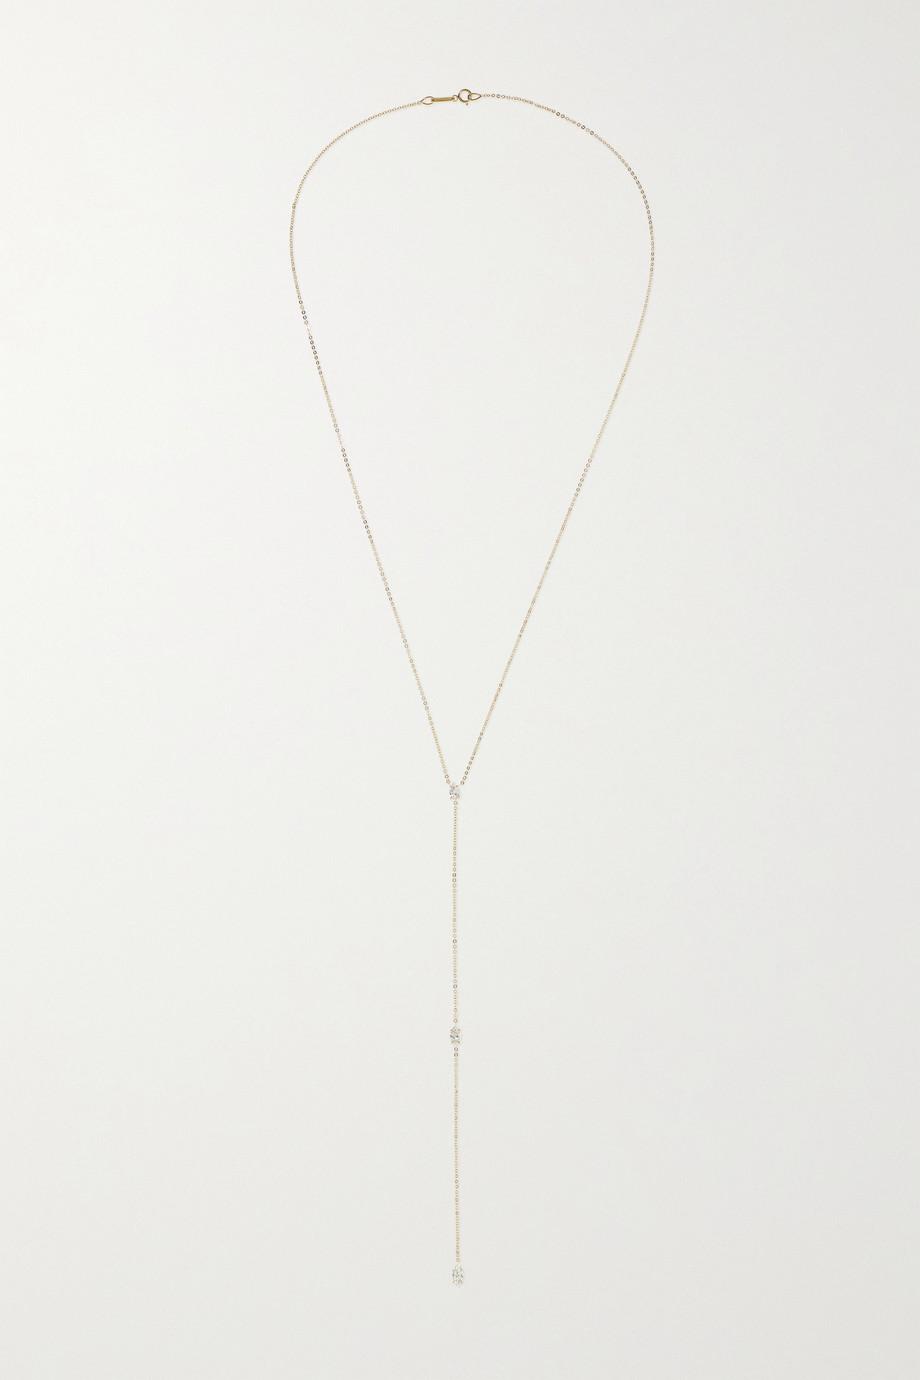 Anita Ko Collier en or 18 carats et diamants